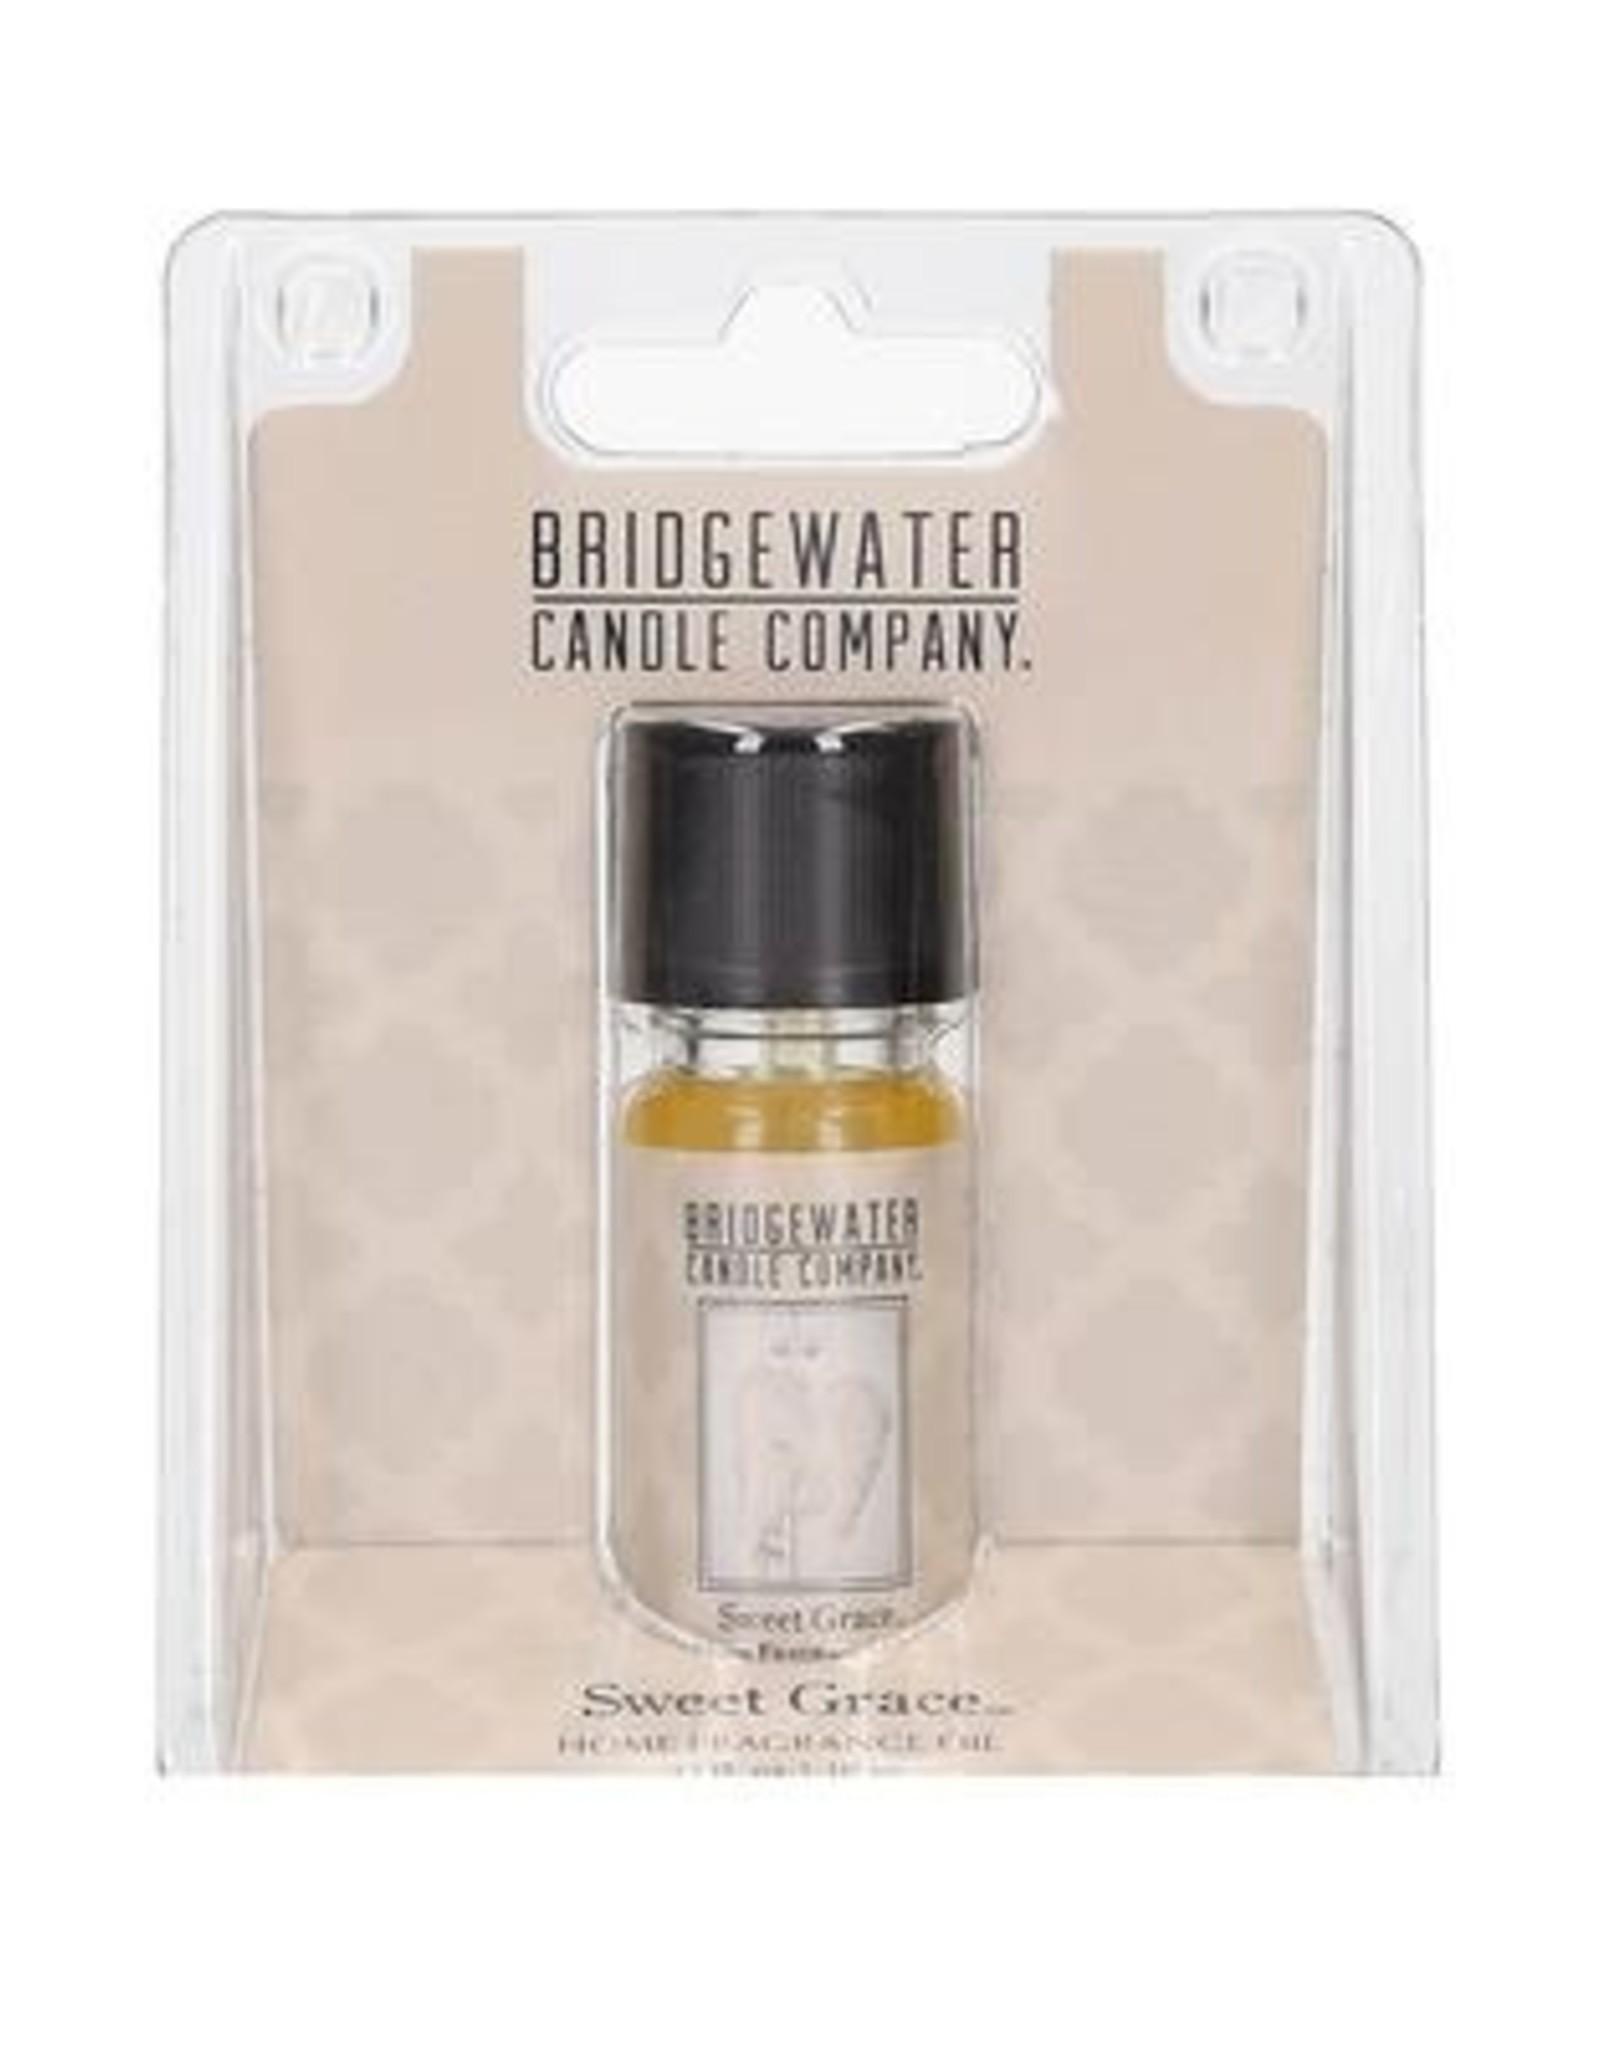 Bridgewater Sweet Grace Home Fragrance Oil